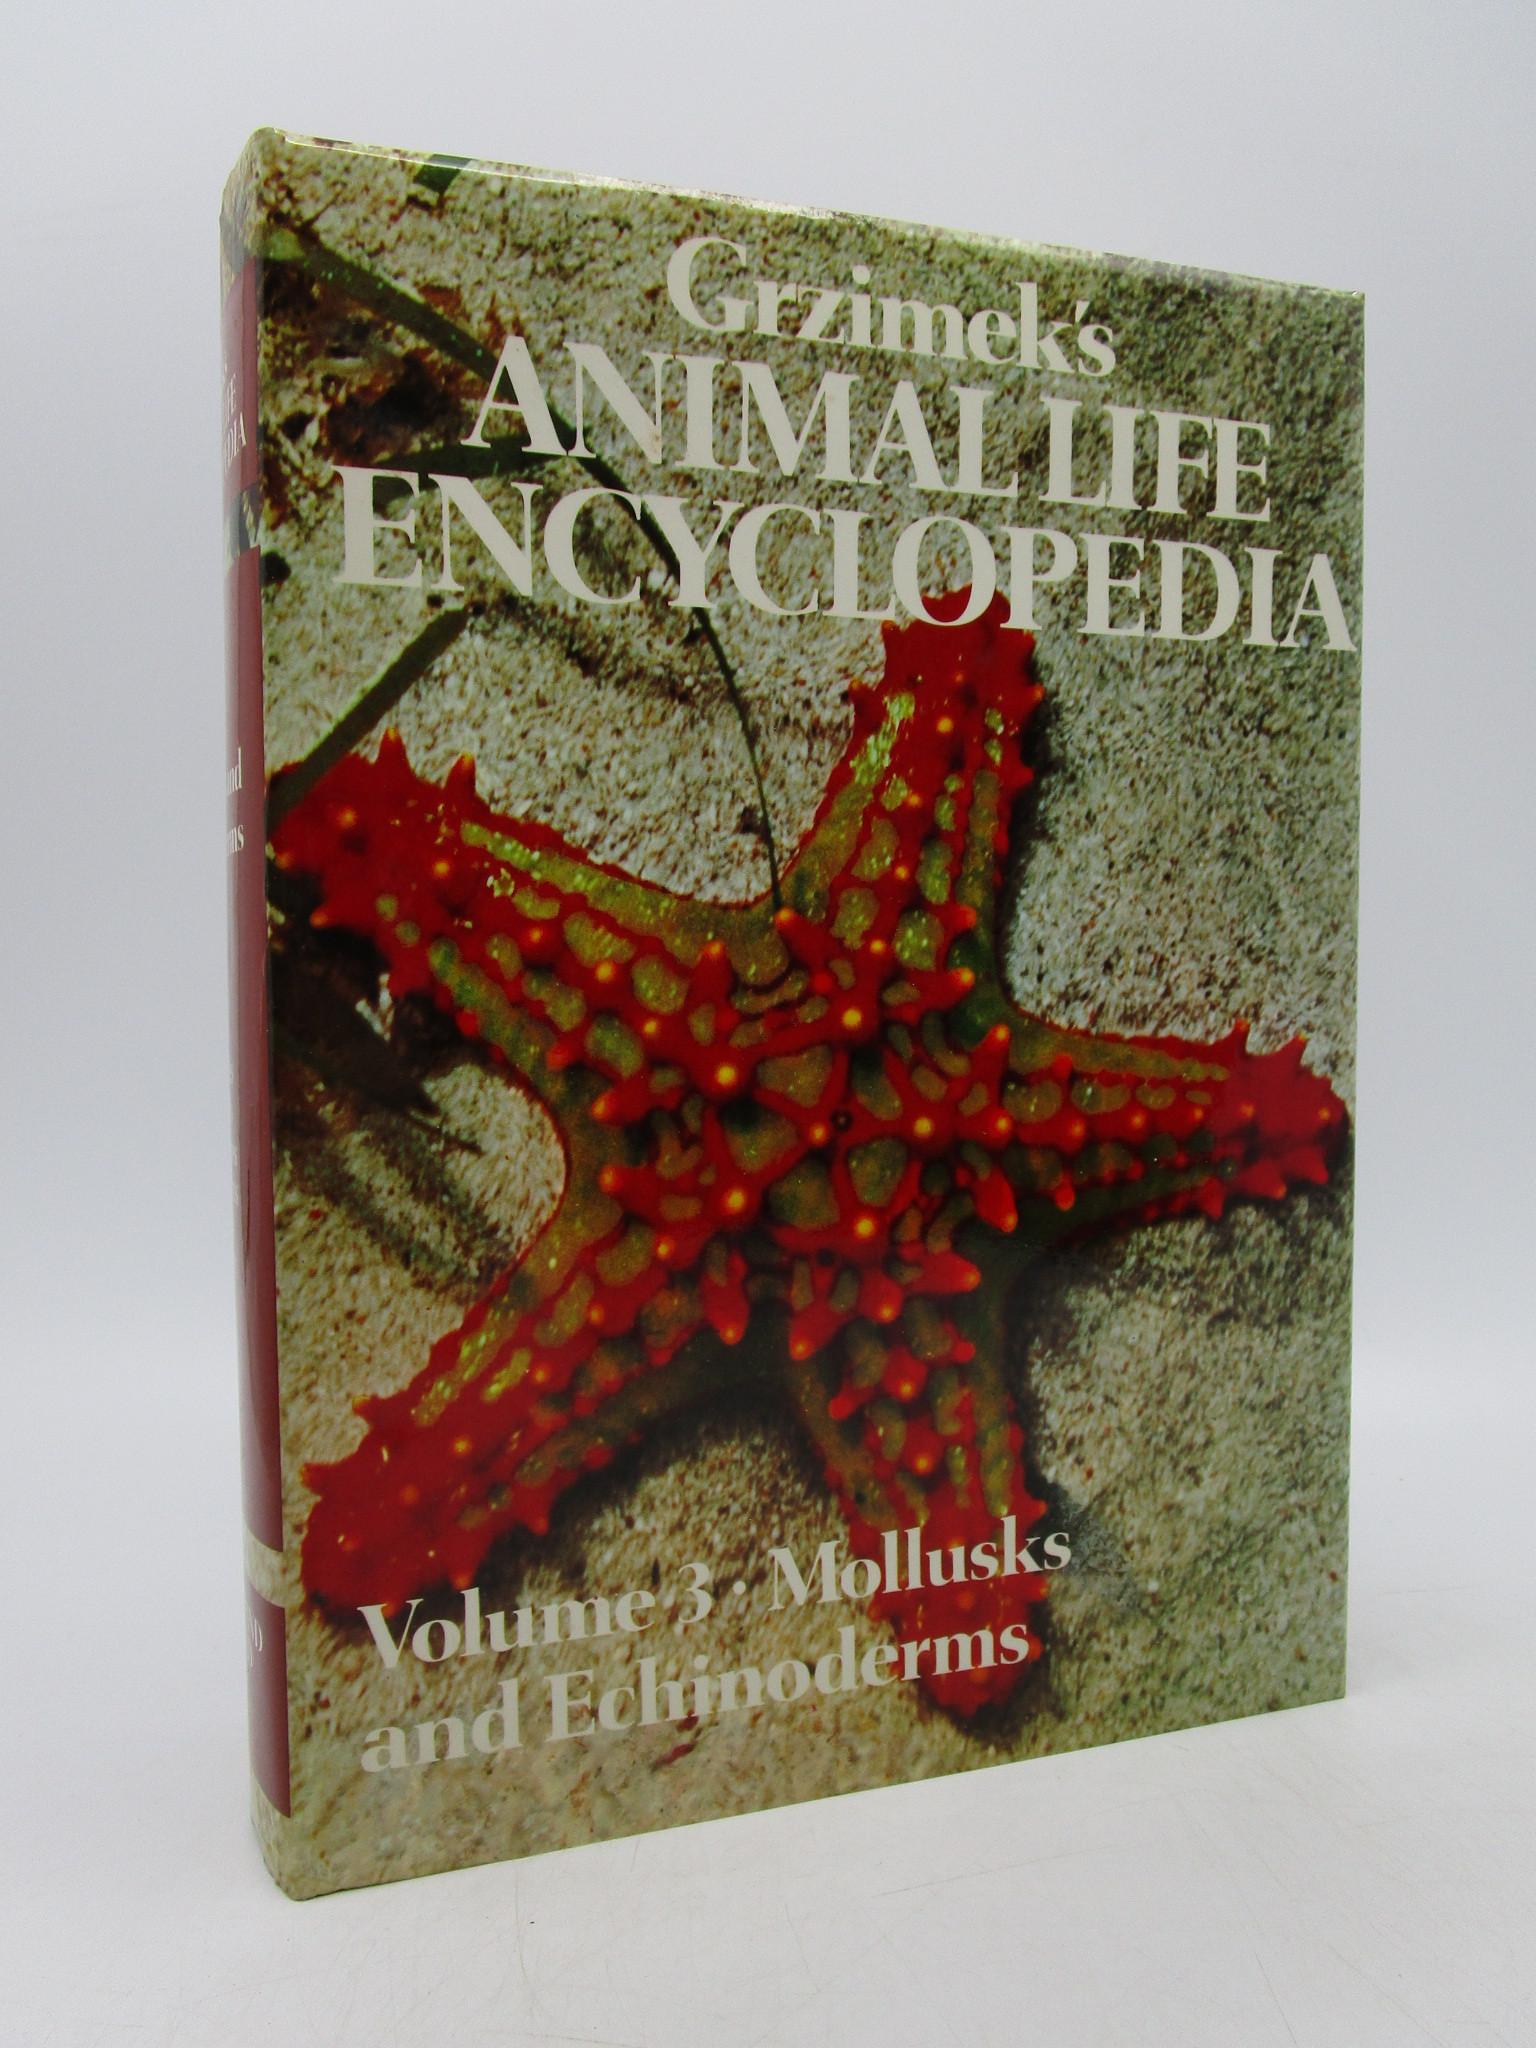 Image for Grzimek's Animal Life Encyclopedia: Volume 3: Mollusks and Echinoderms